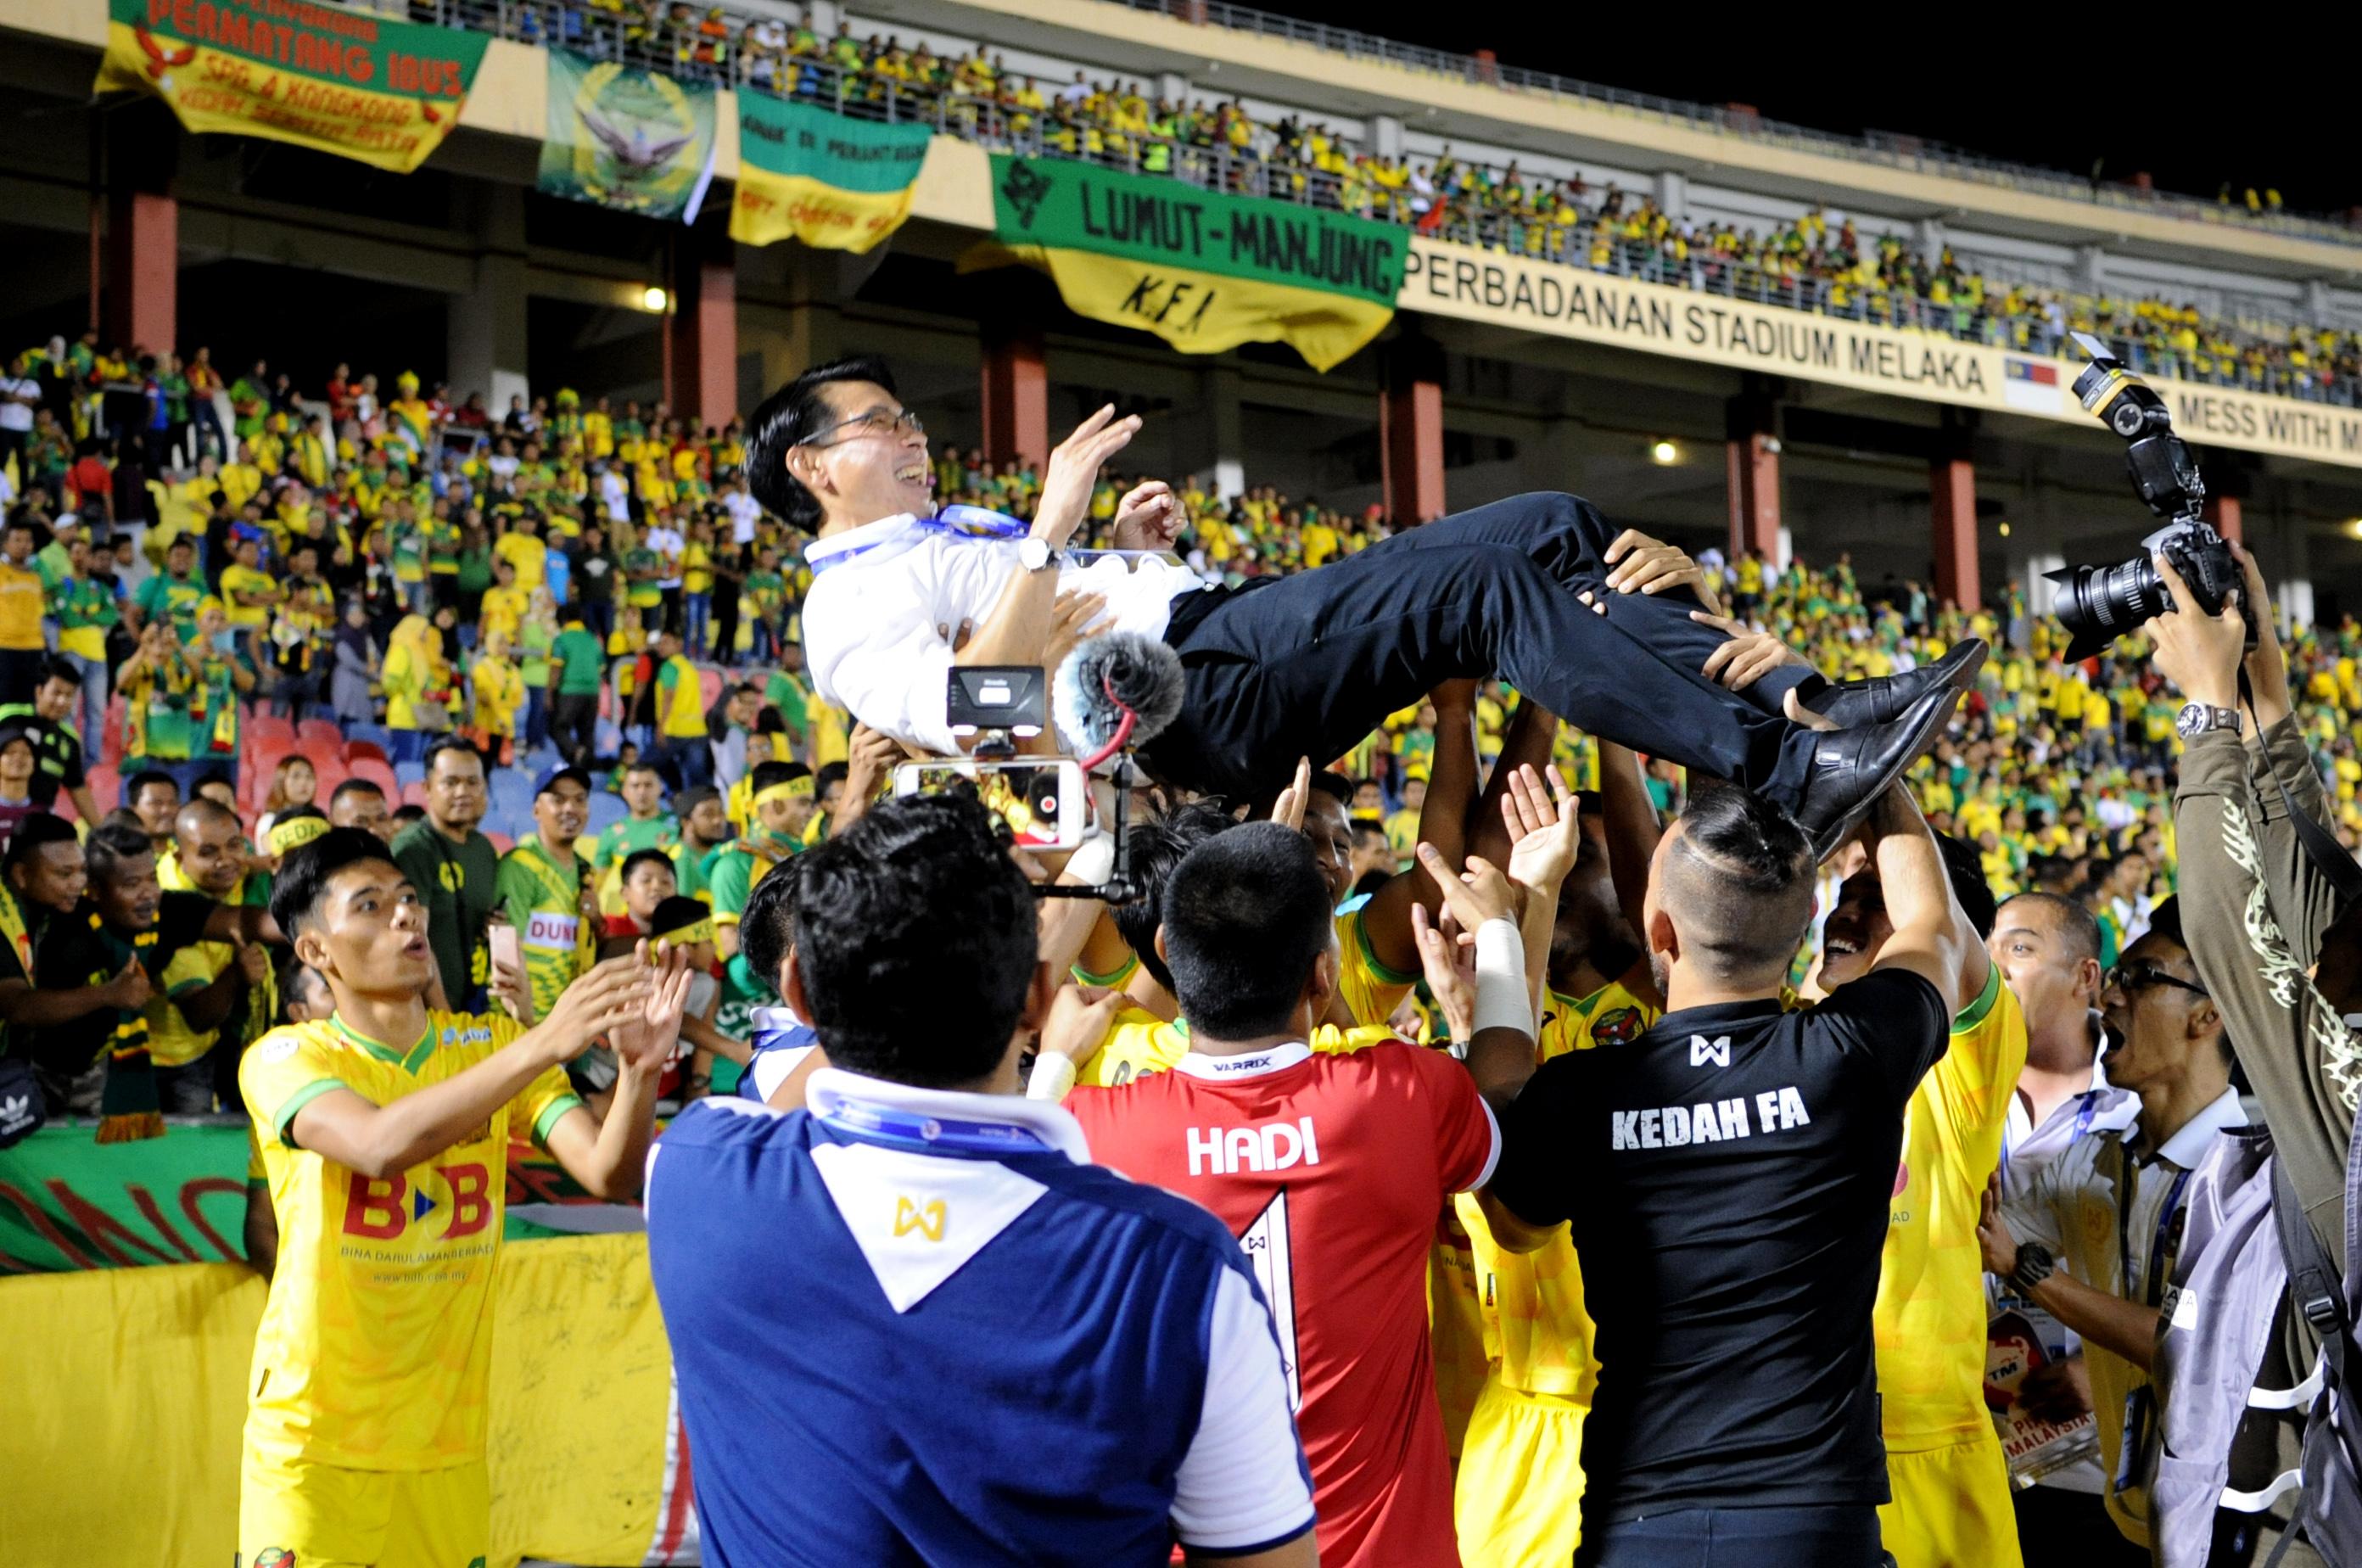 Kedah's Tan Cheng Hoe celebrating his team's win 2016